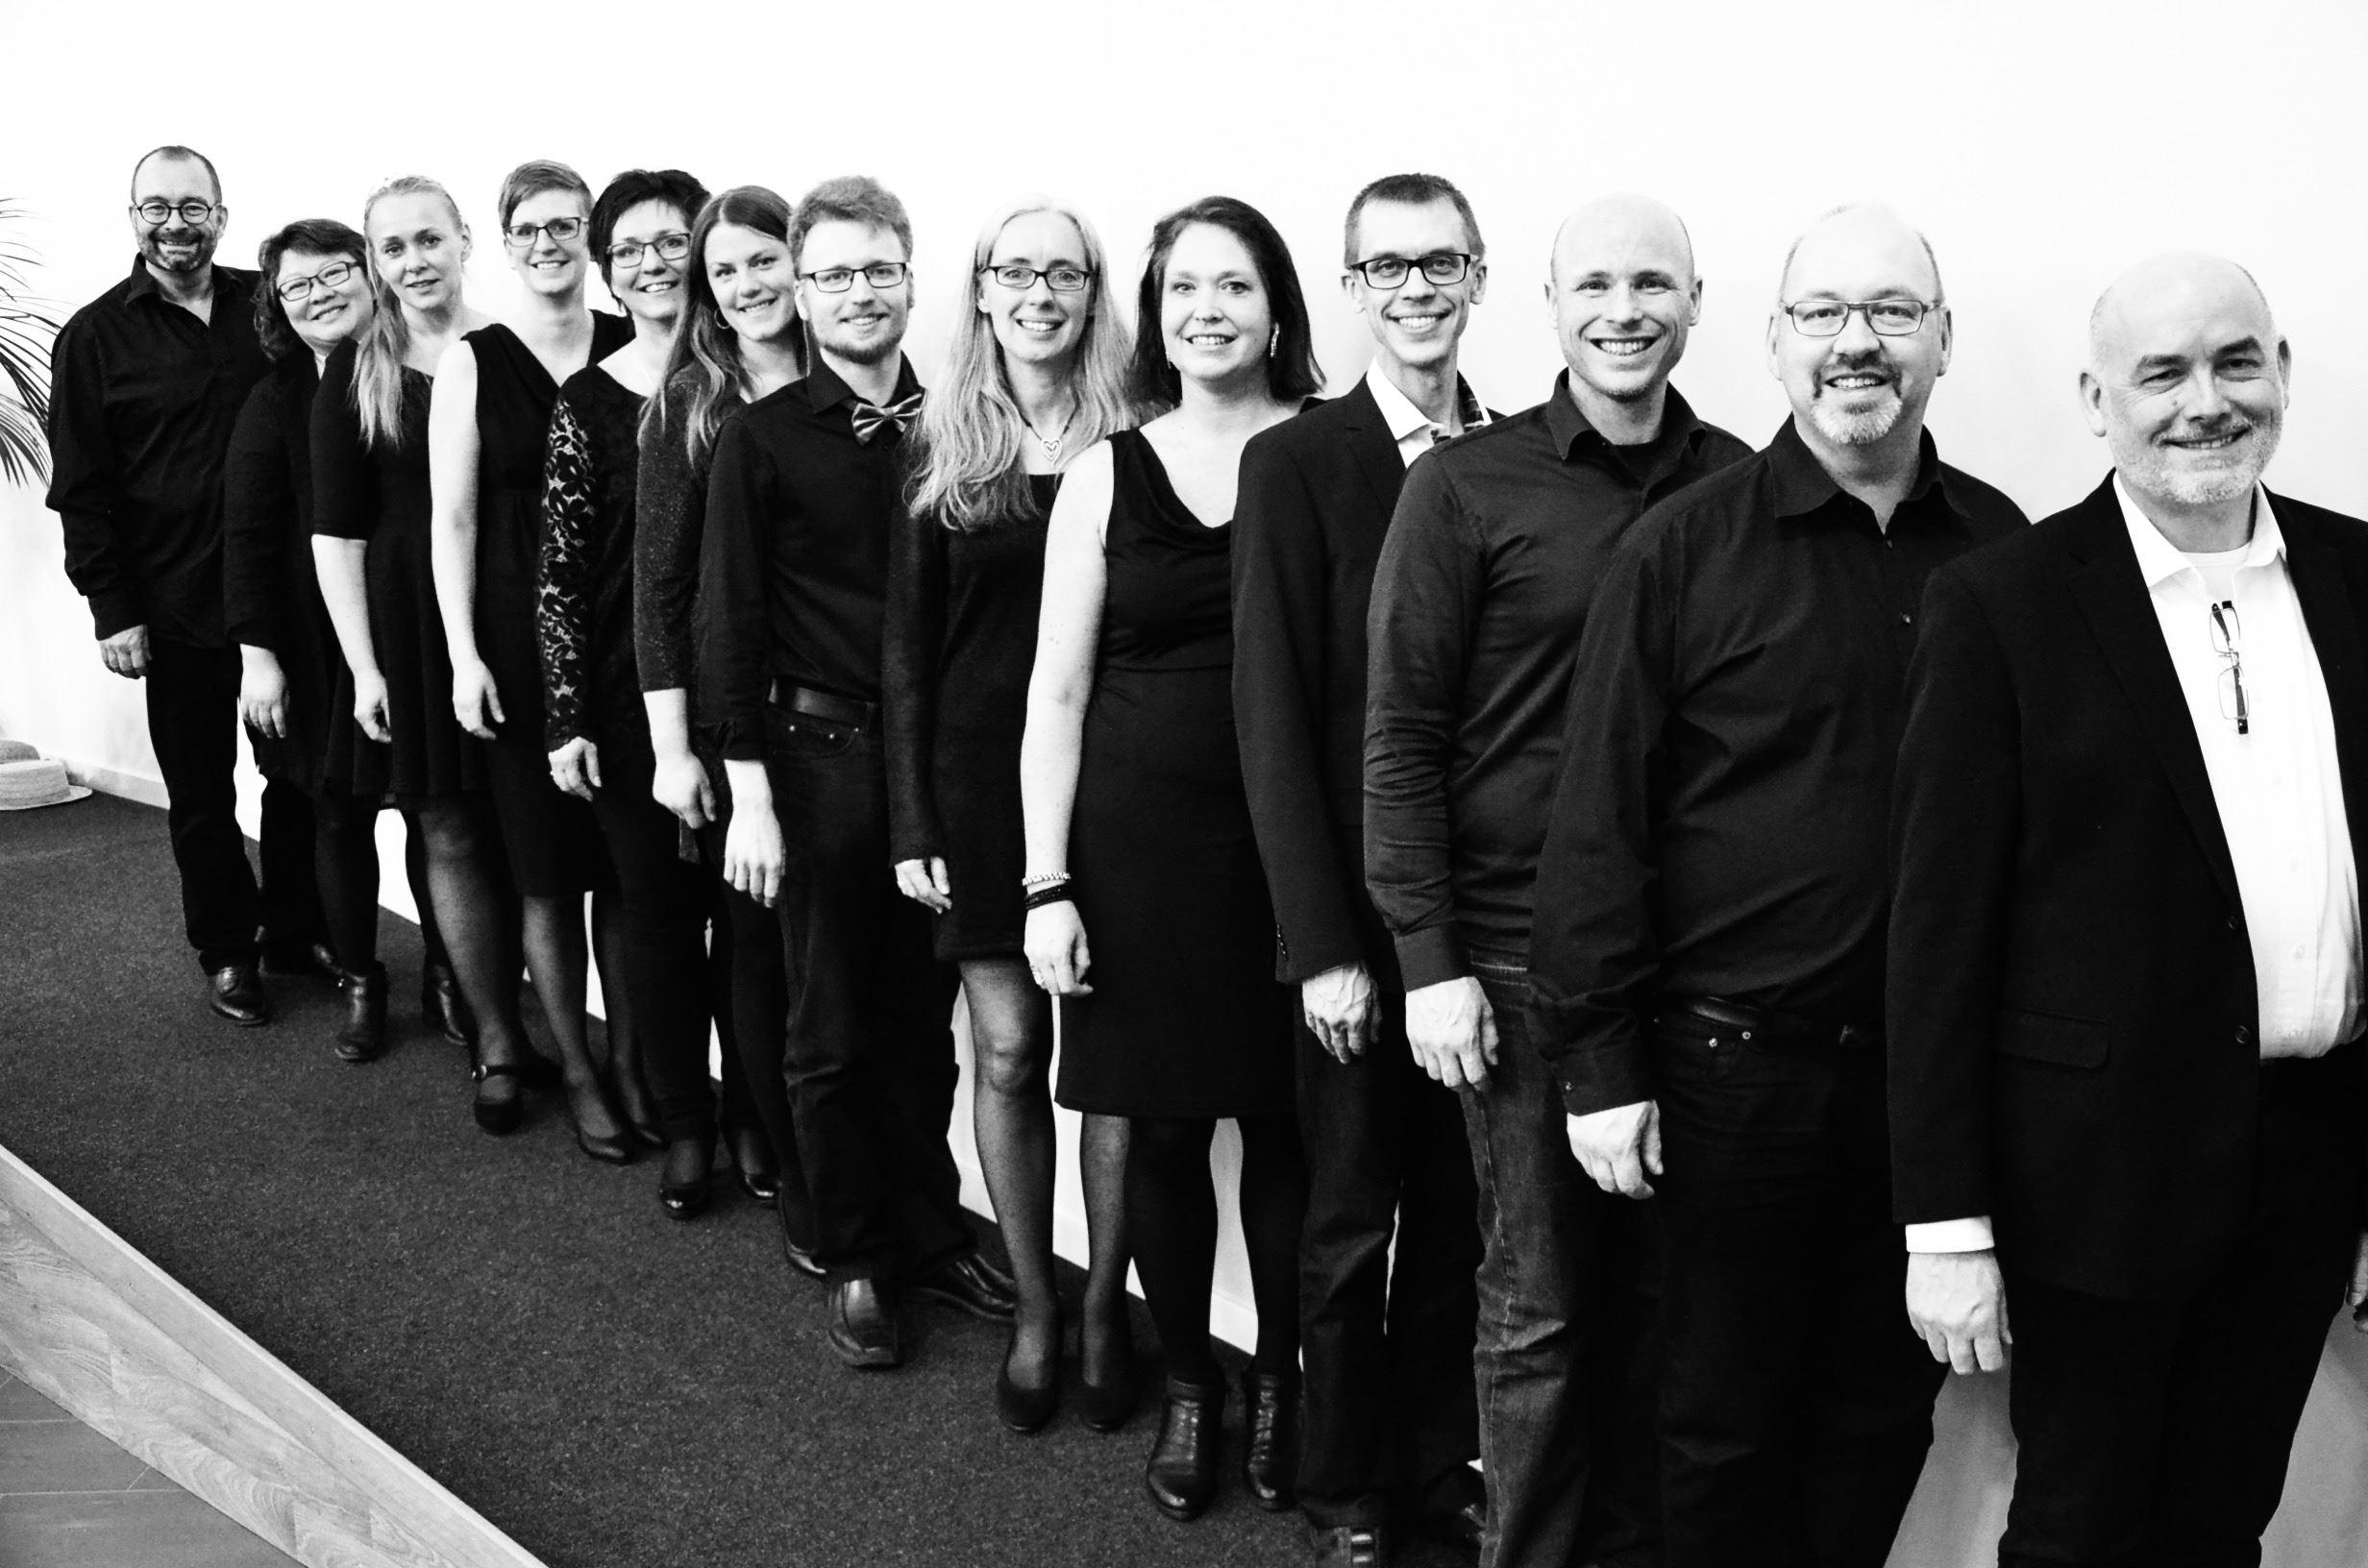 Vokalensemblen Vox Magica presenterar: Från Småland till Savannen